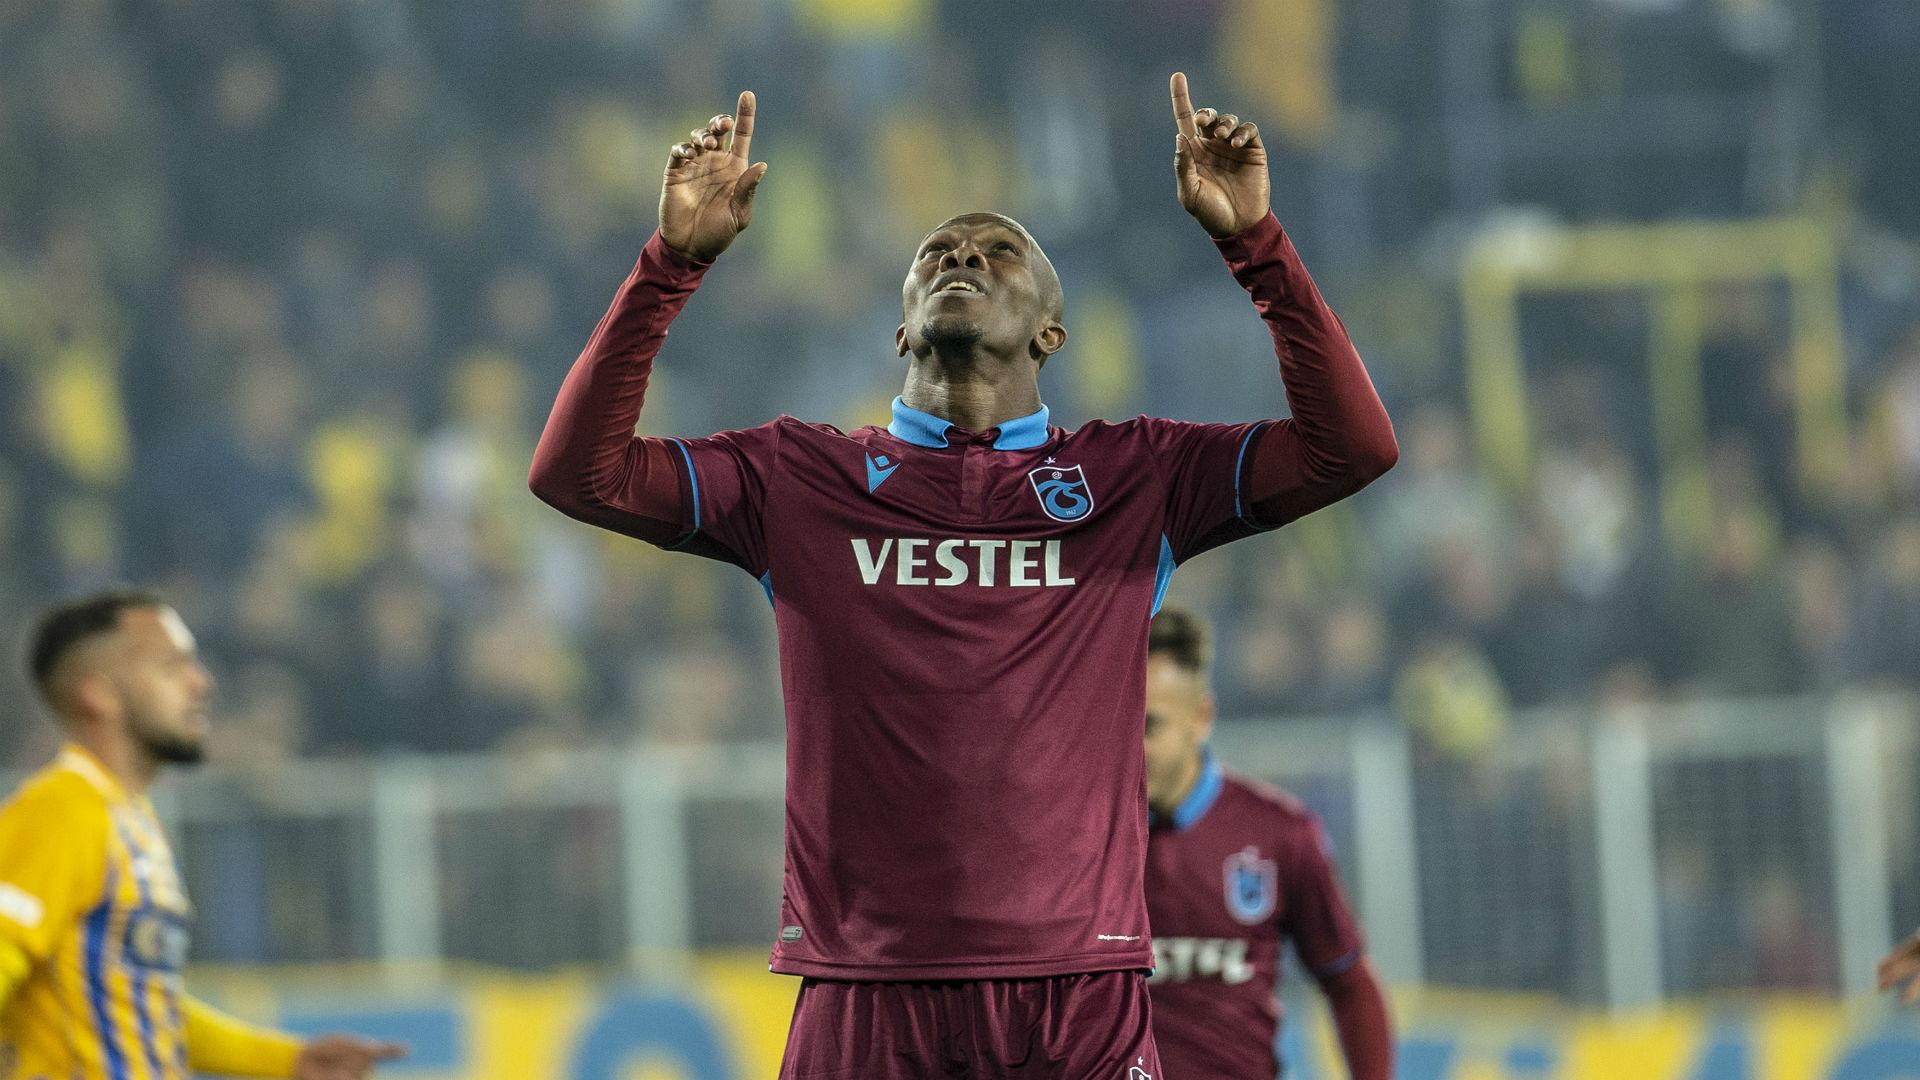 Nwakaeme bags brace, Koita nets winner as Kasimpasa edge past Trabzonspor